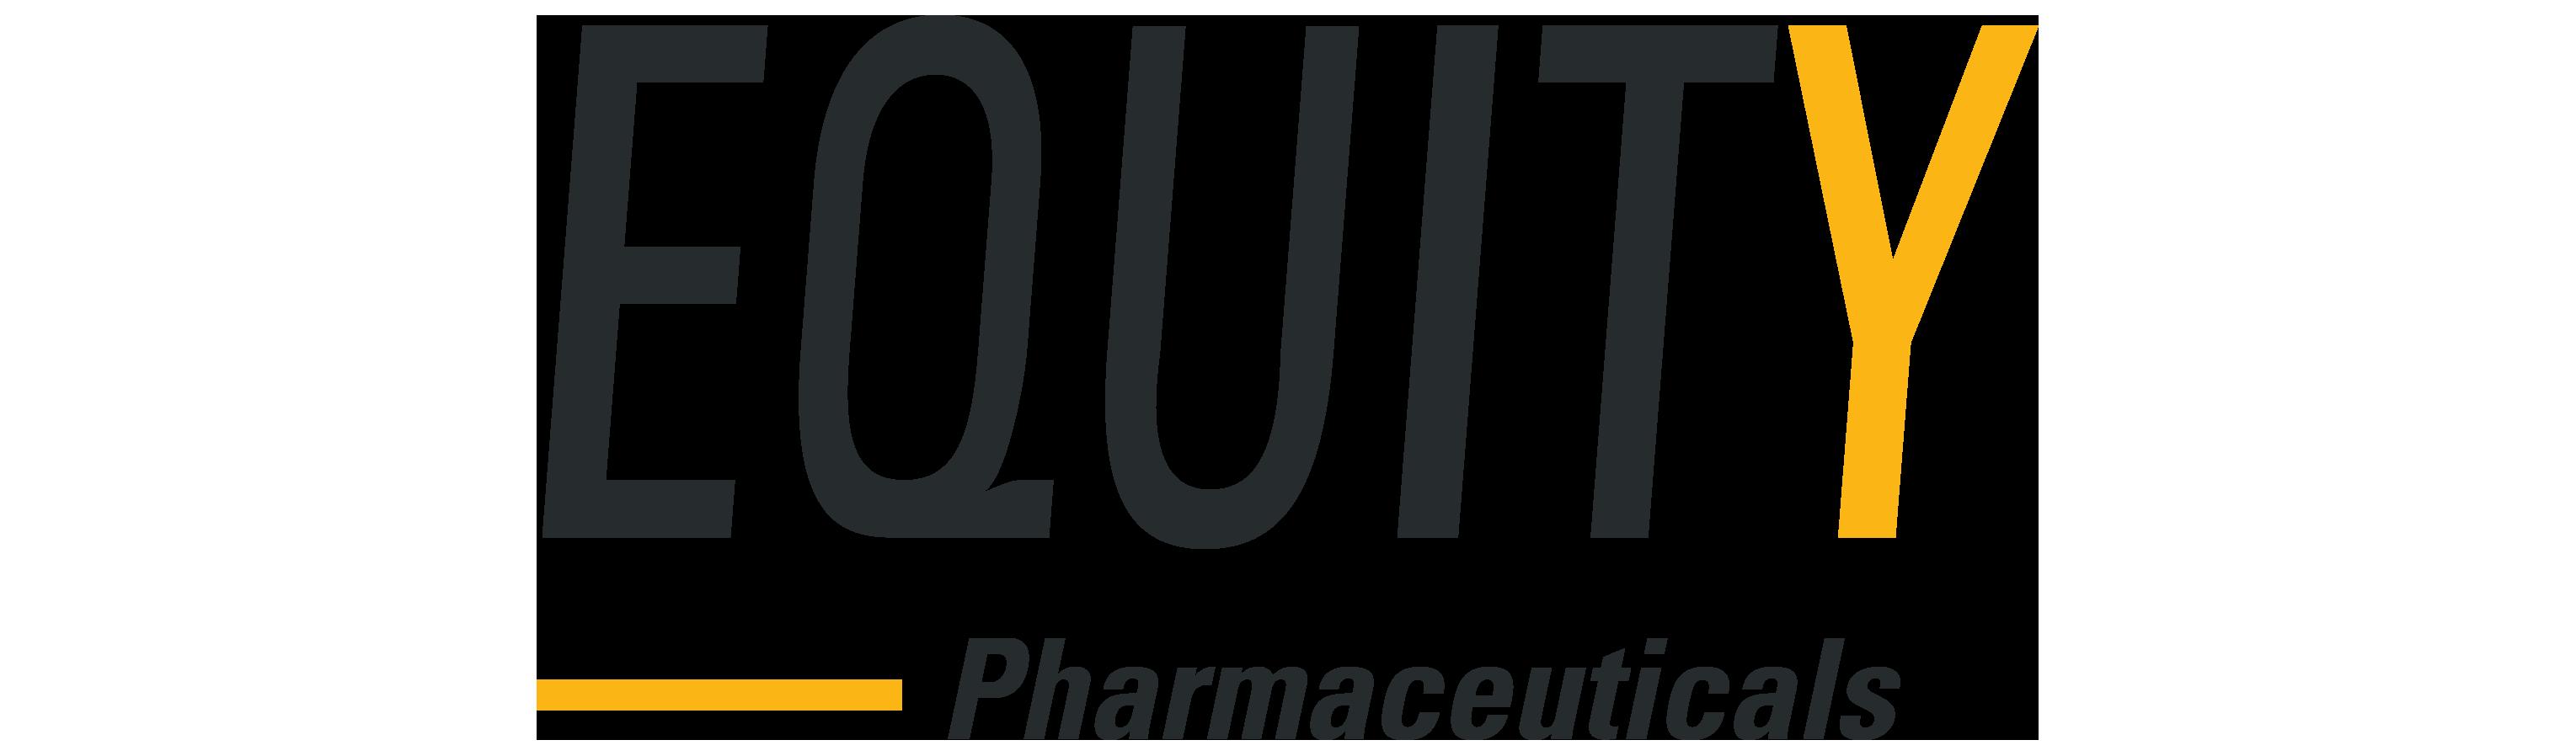 Equity-Pharma